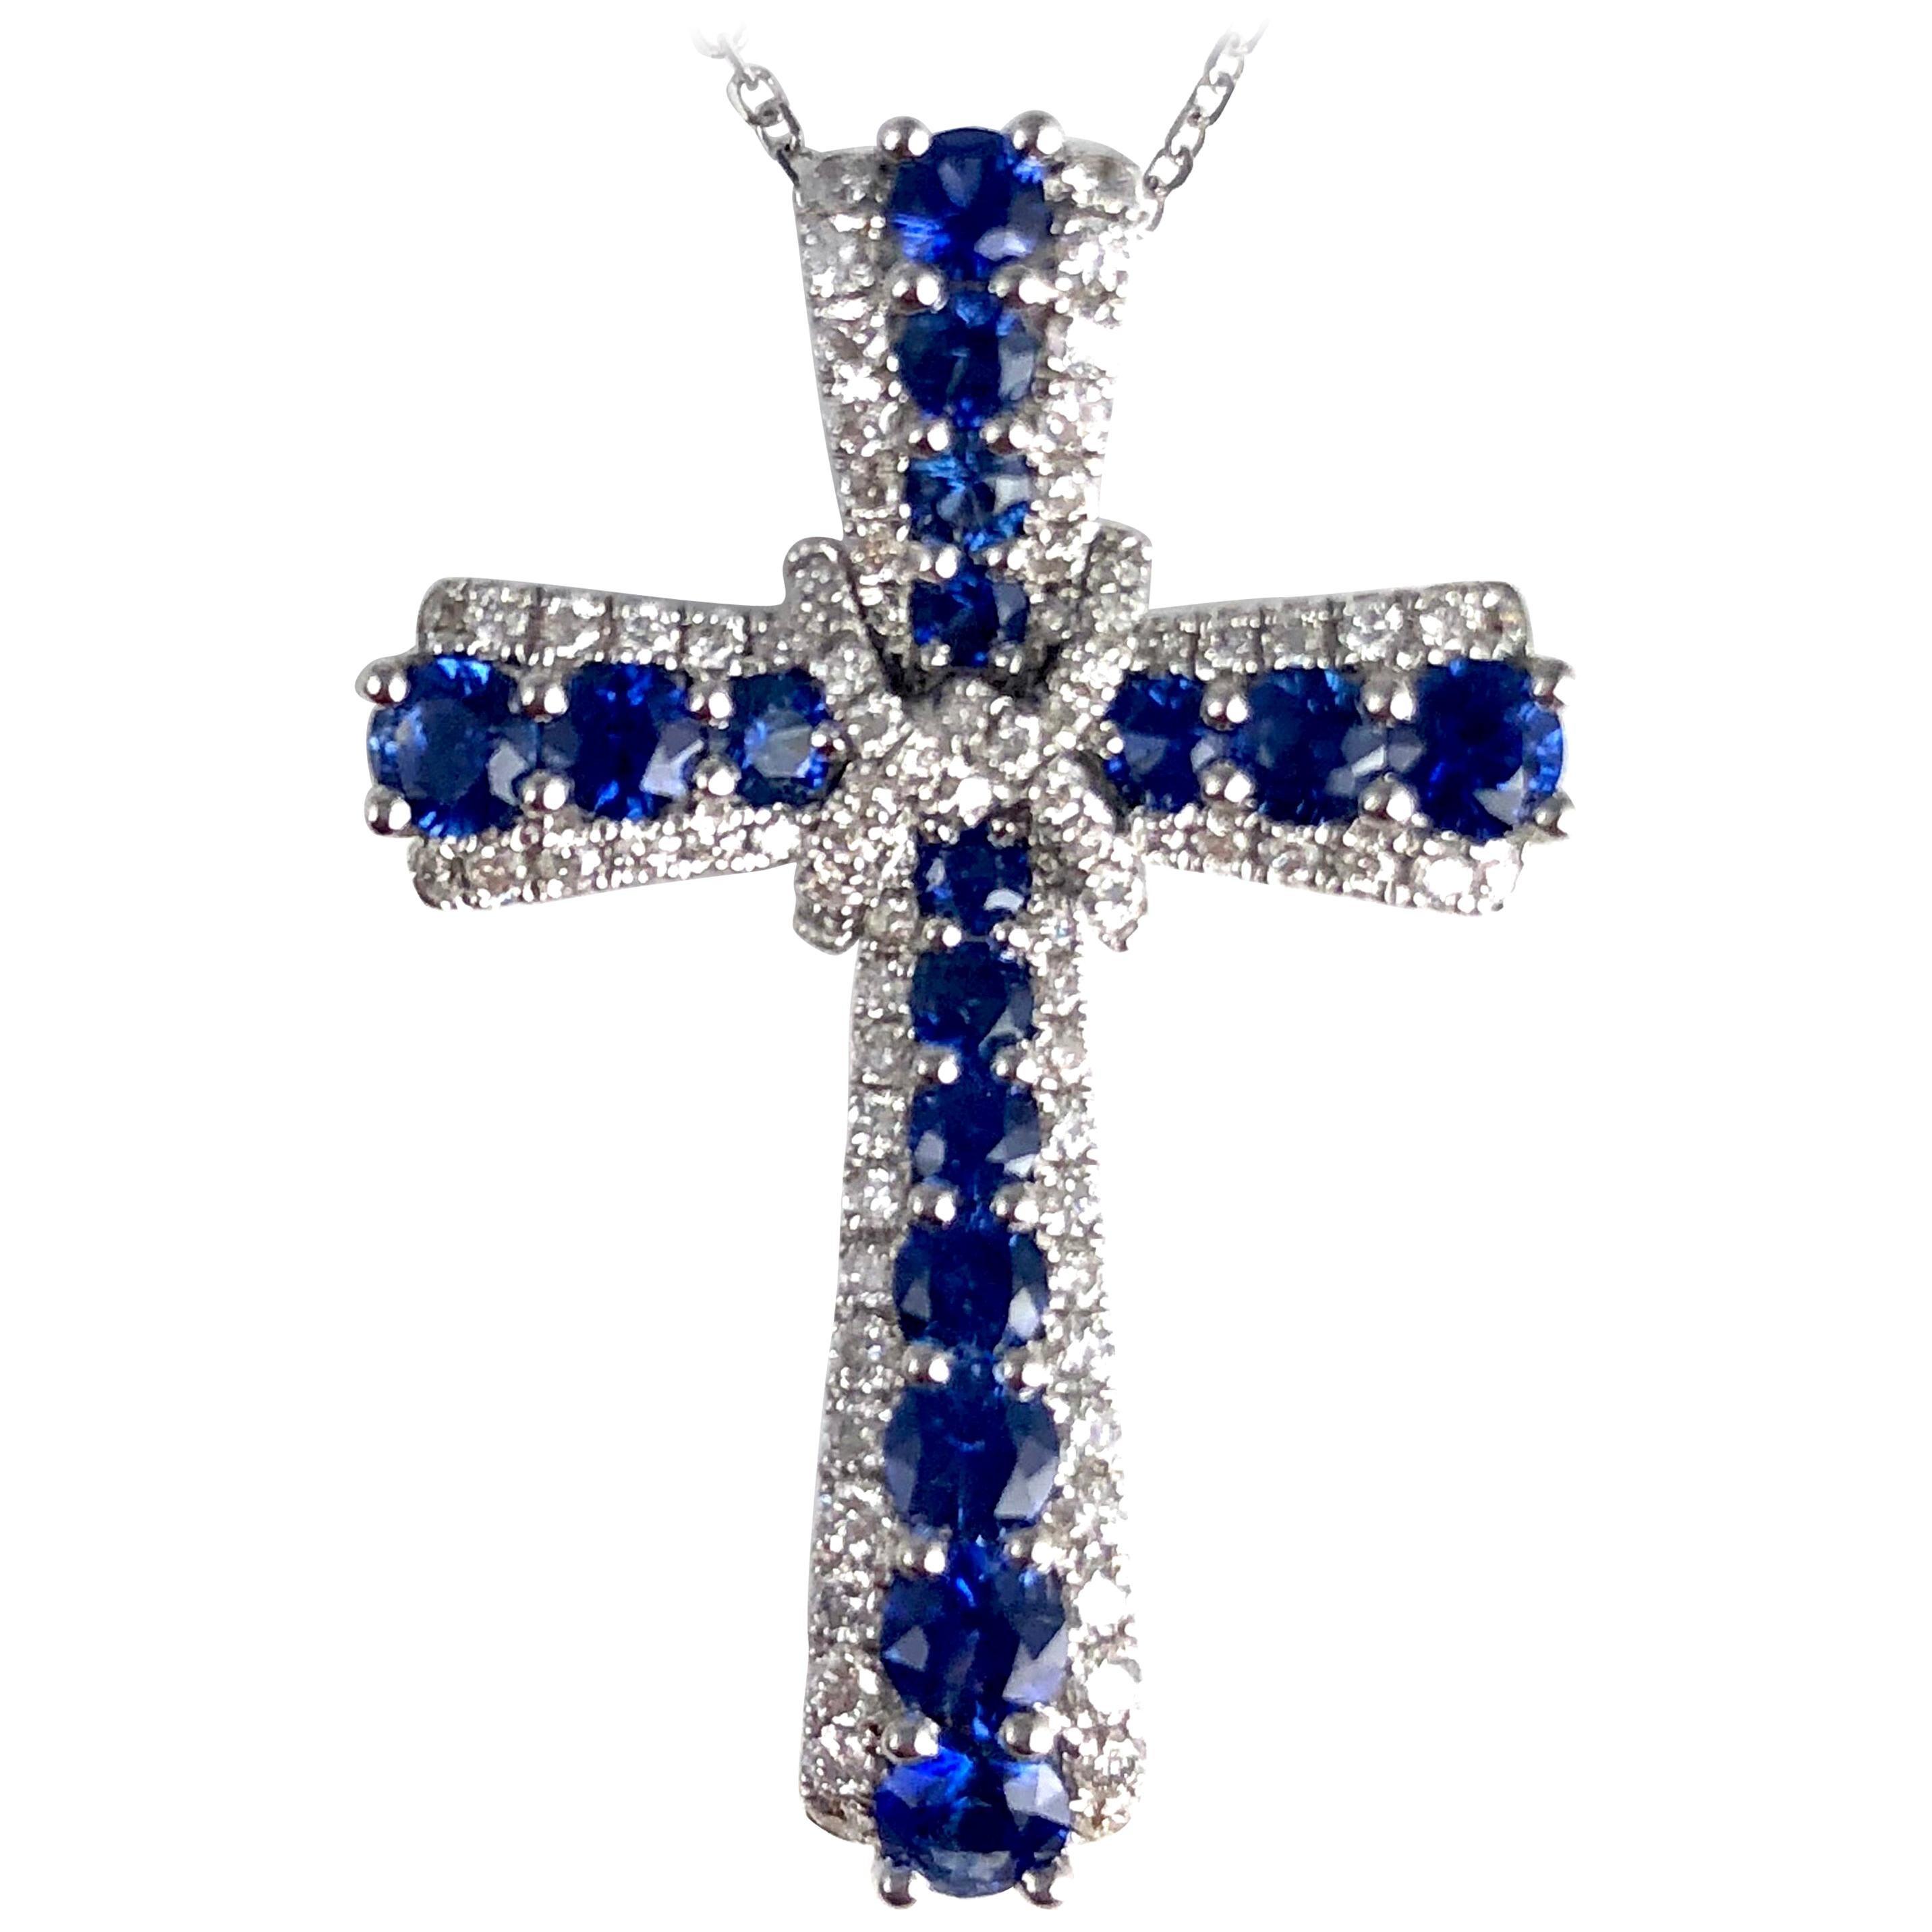 DiamondTown 0.92 Carat Vivid Blue Sapphire and Diamond Embellished Cross Pendant